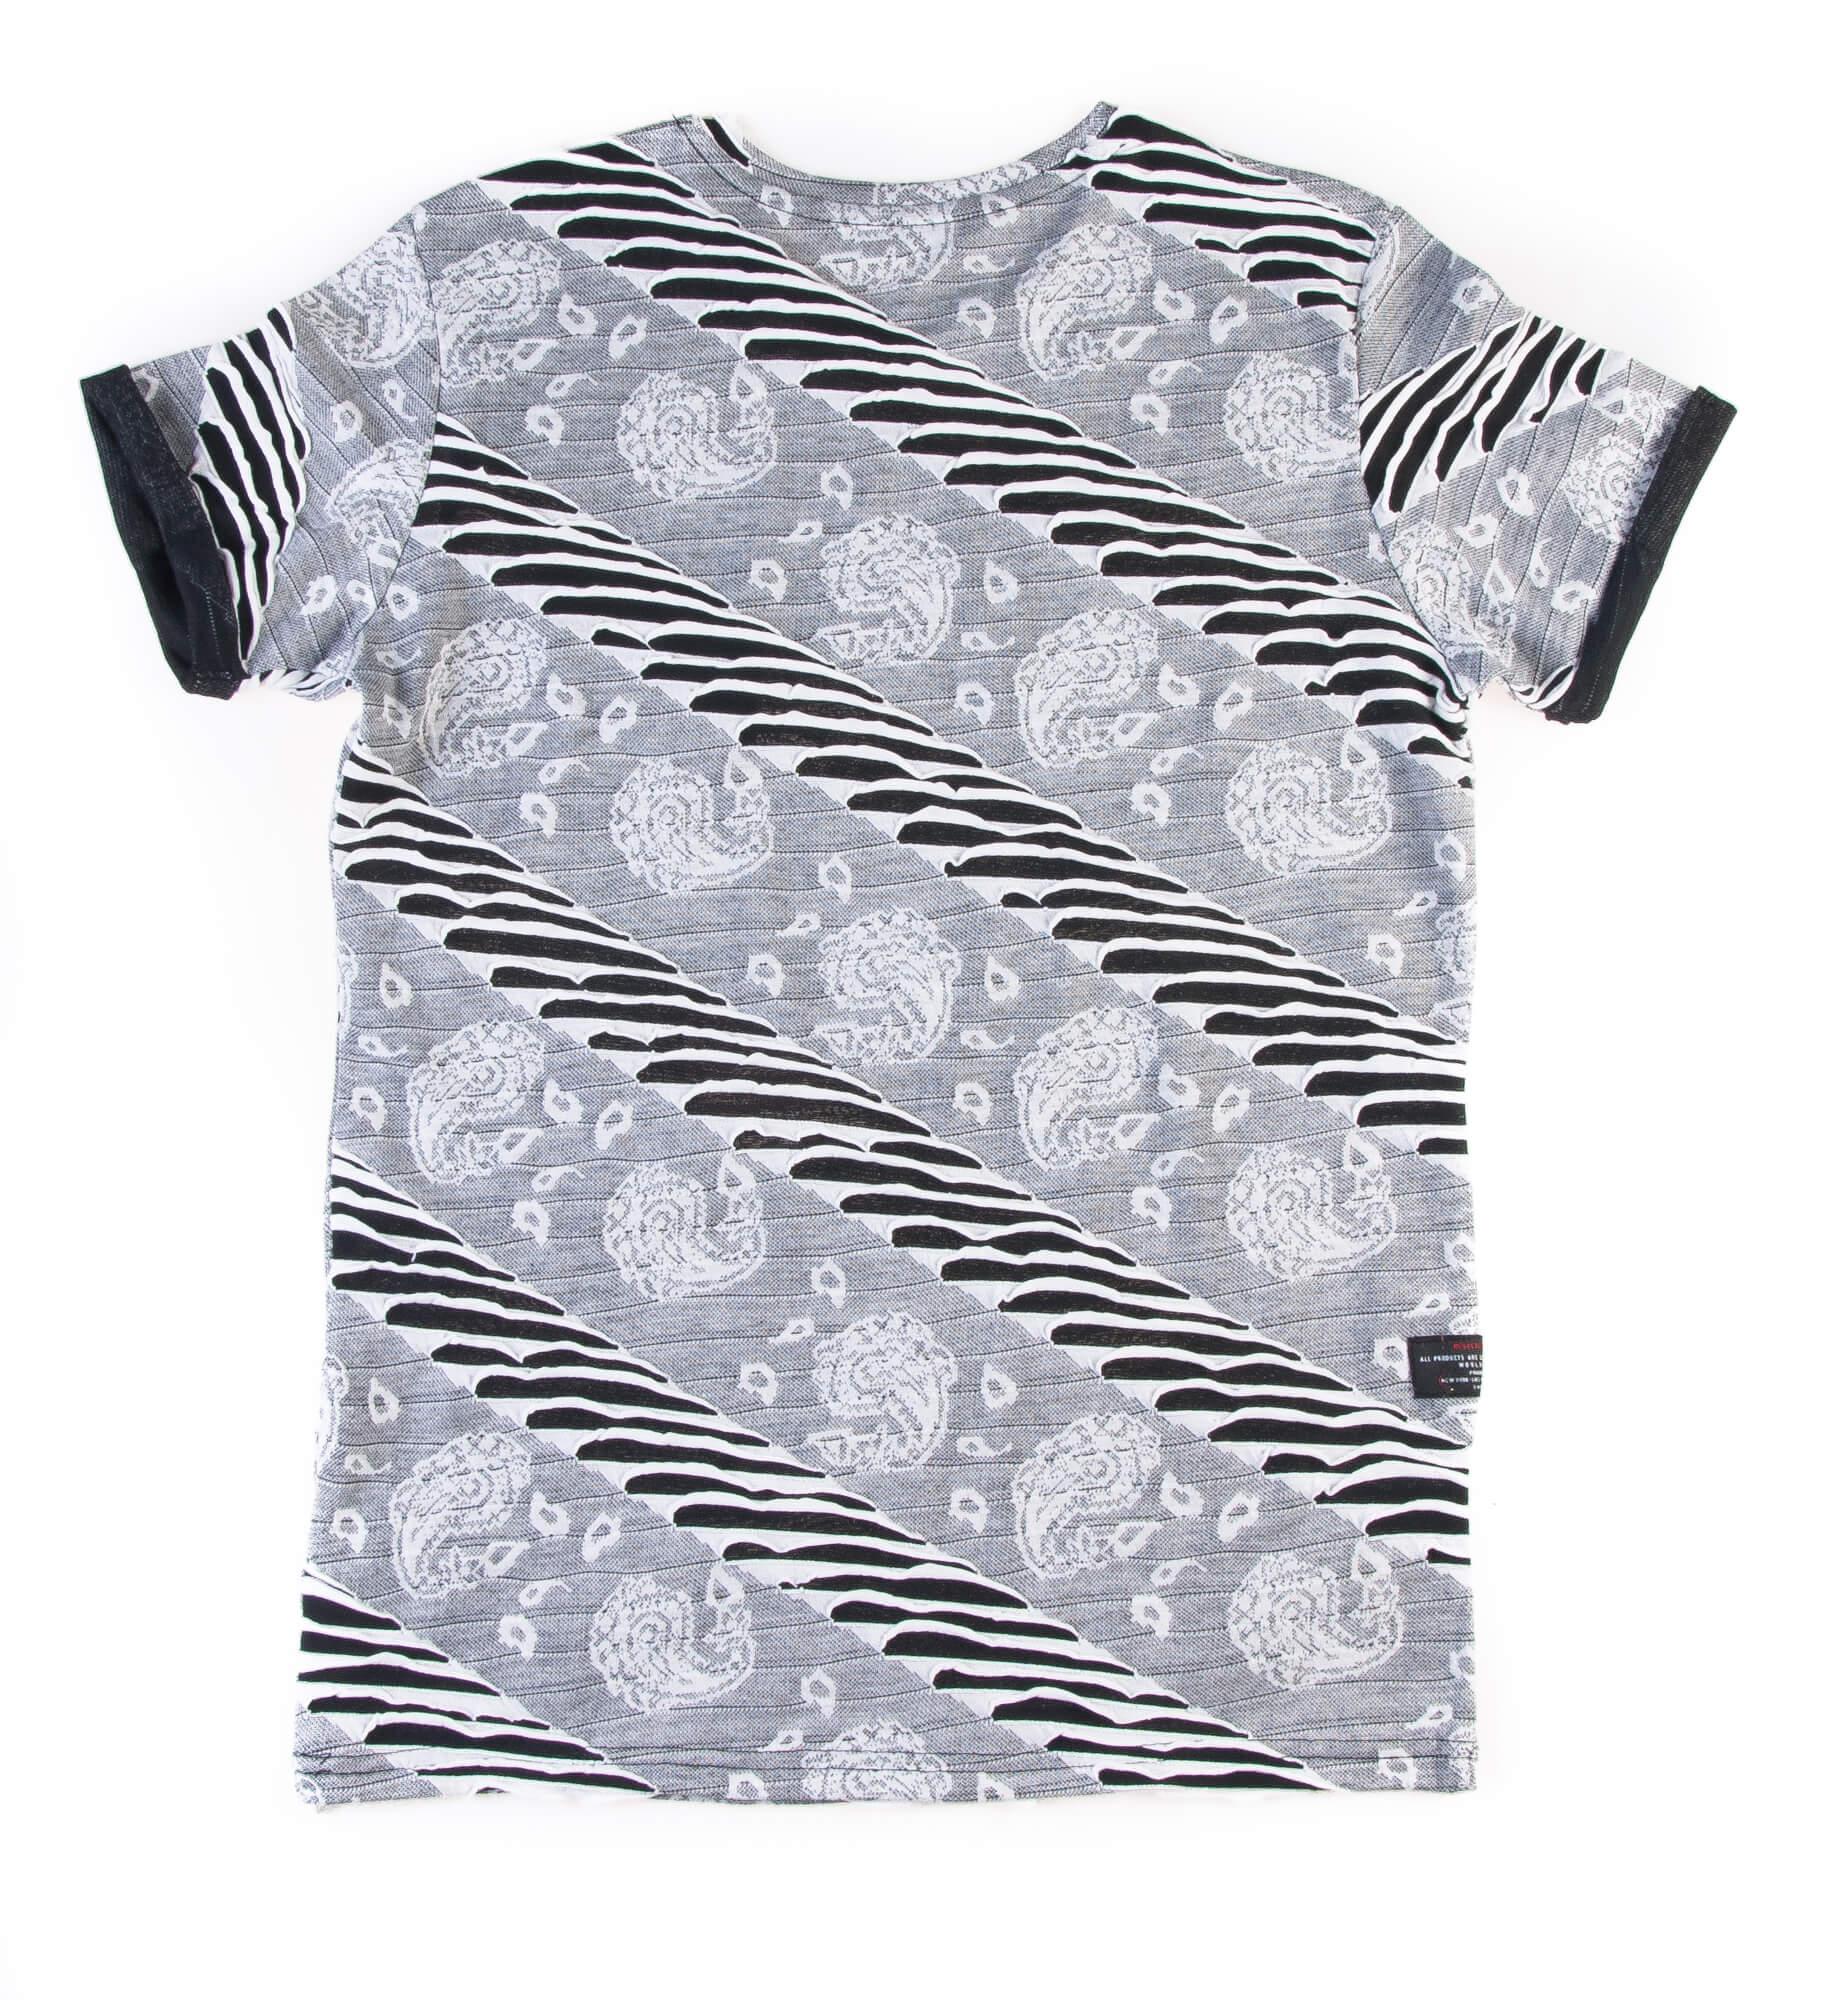 تی شرت مردانه برند ماچ مور S1035 MUCH MORE